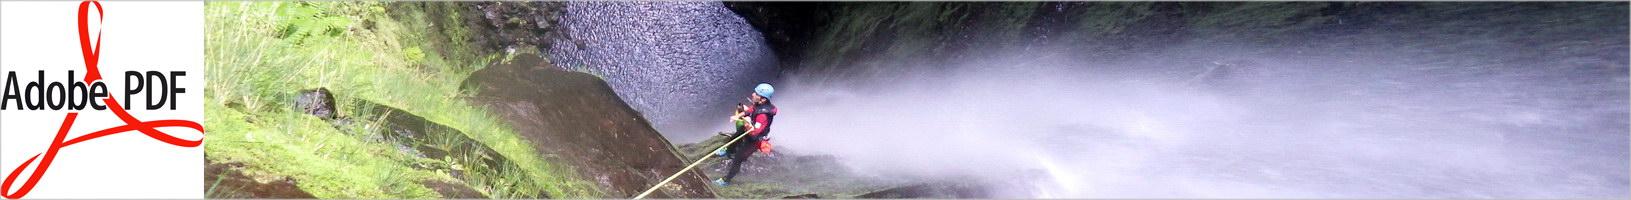 Artículo apertura del barranco Capulla | Madeira (PT)